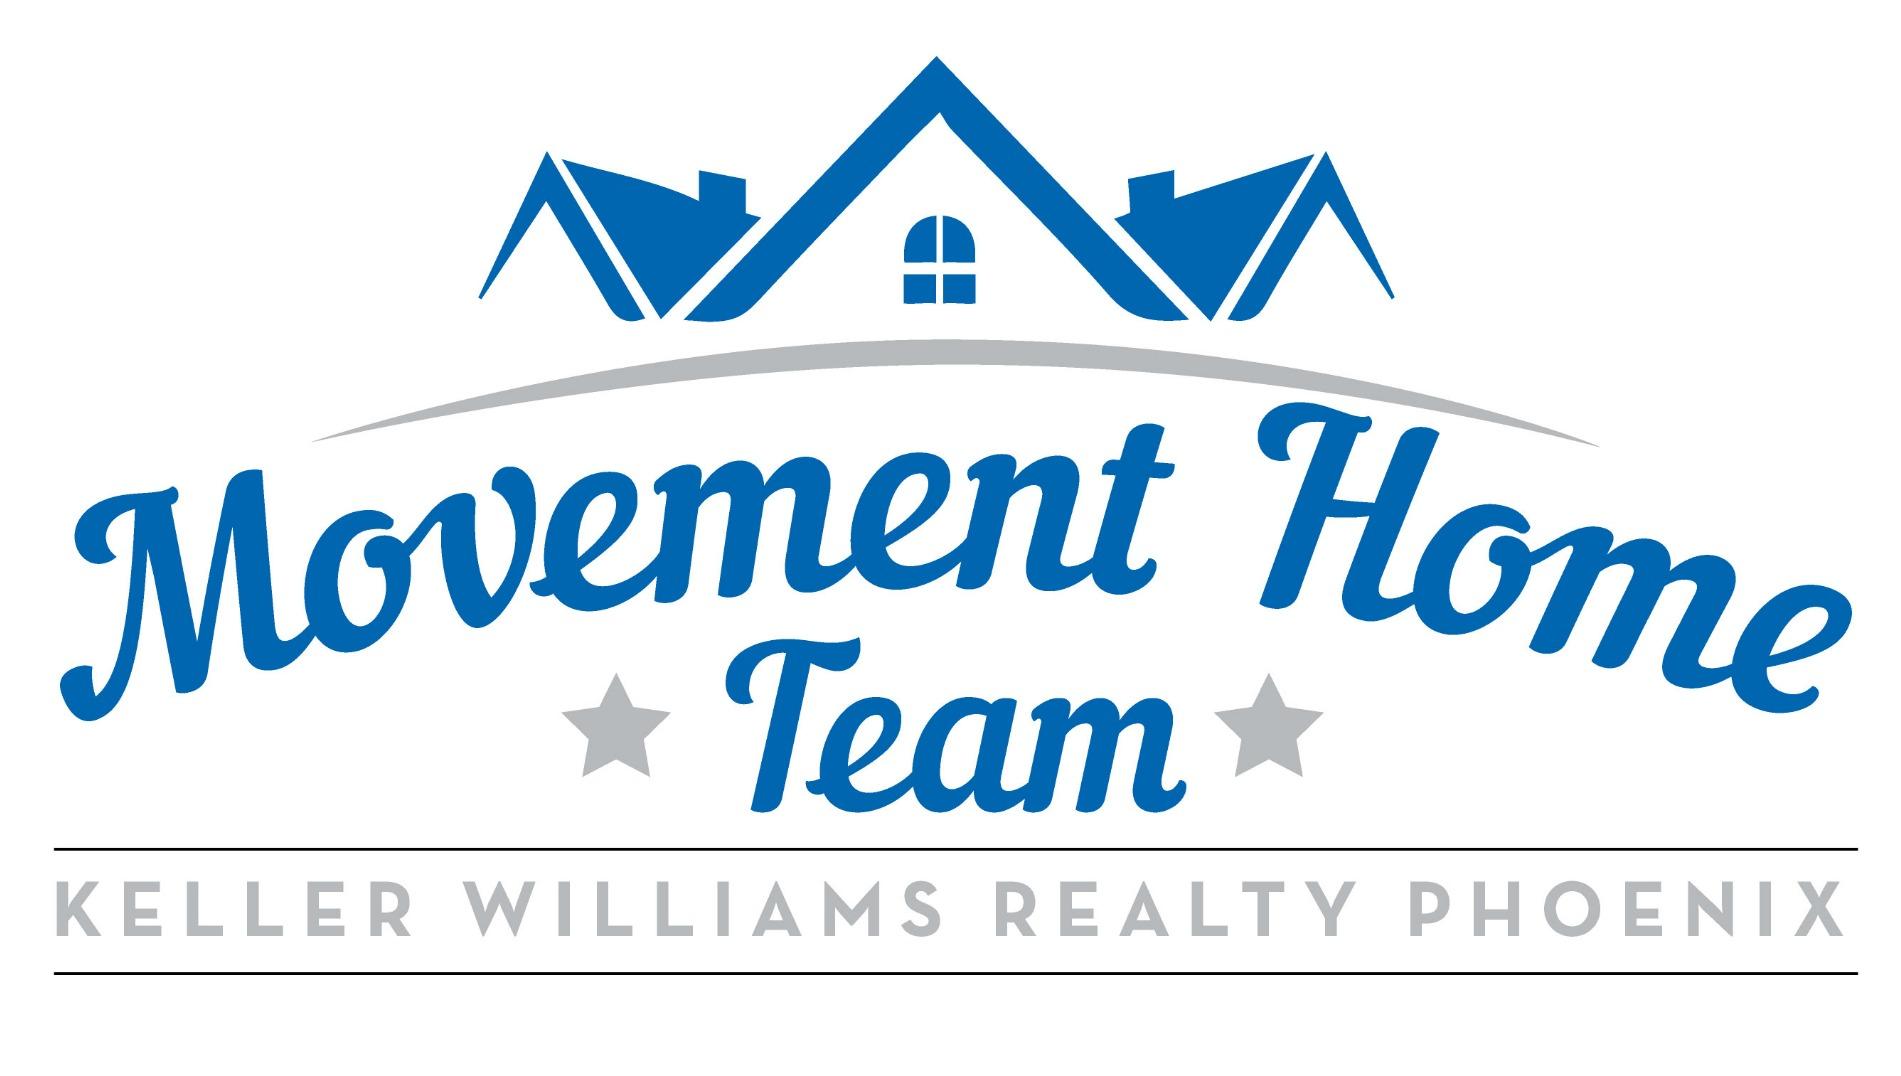 Keller Williams Realty Phoenix logo